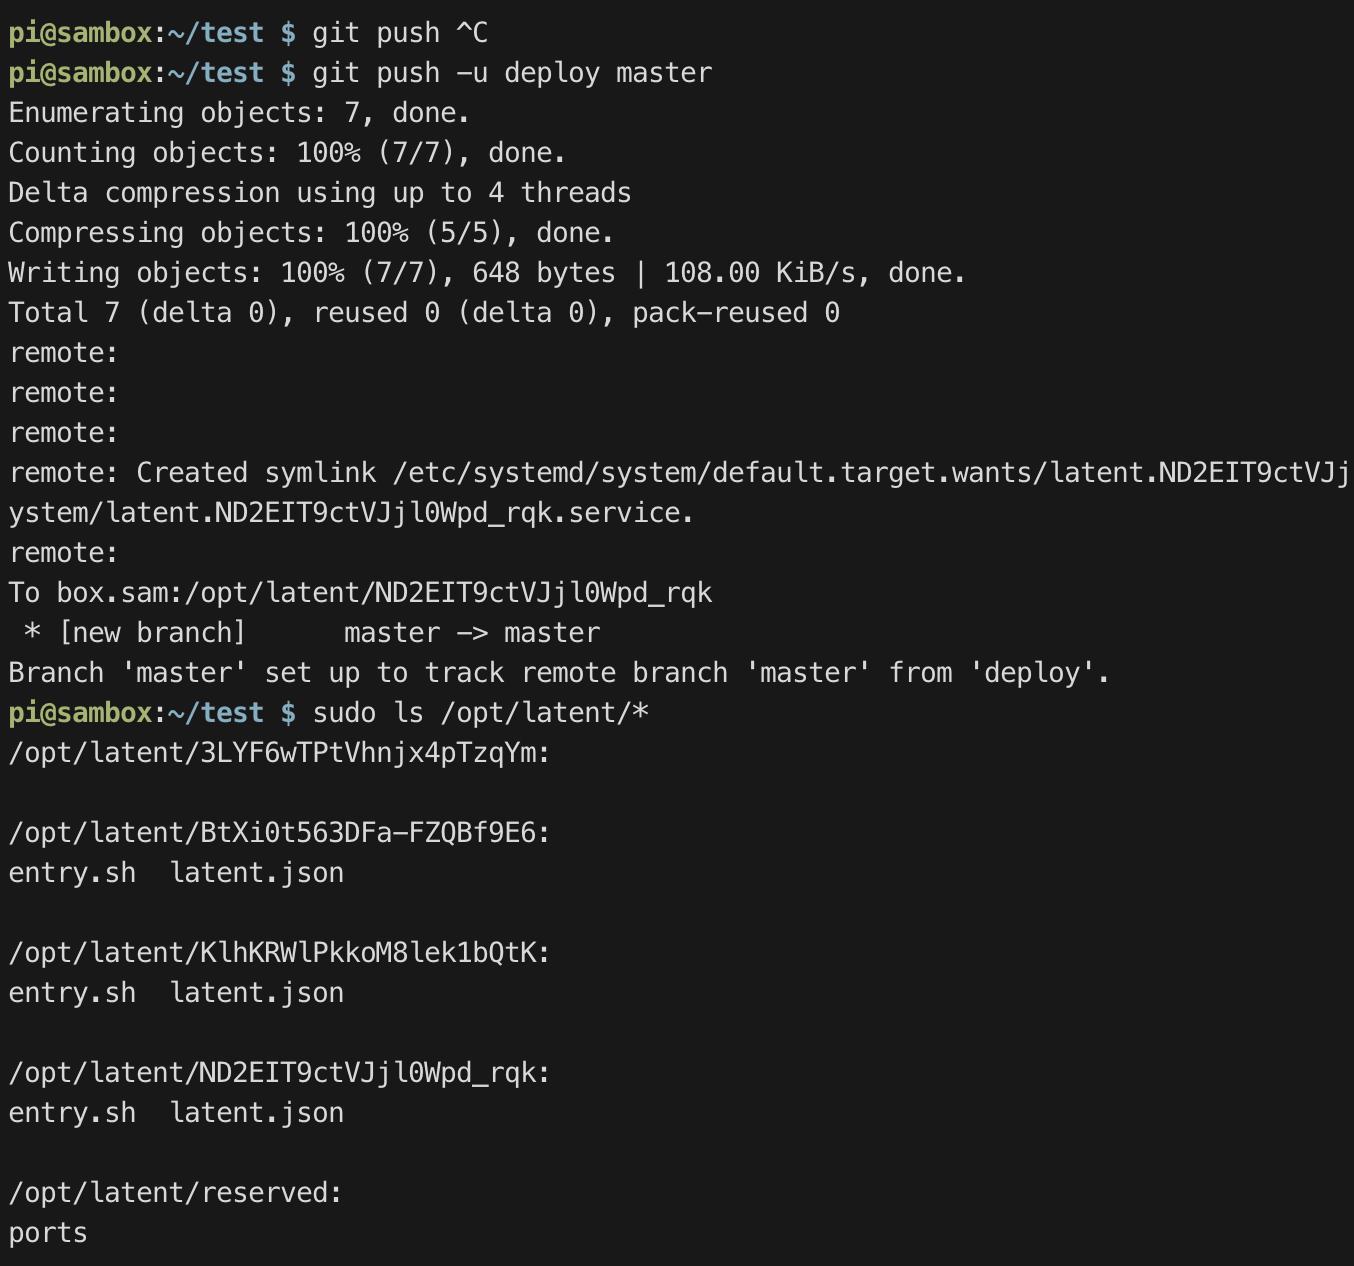 https://cloud-far1wflt2-hack-club-bot.vercel.app/0image.png